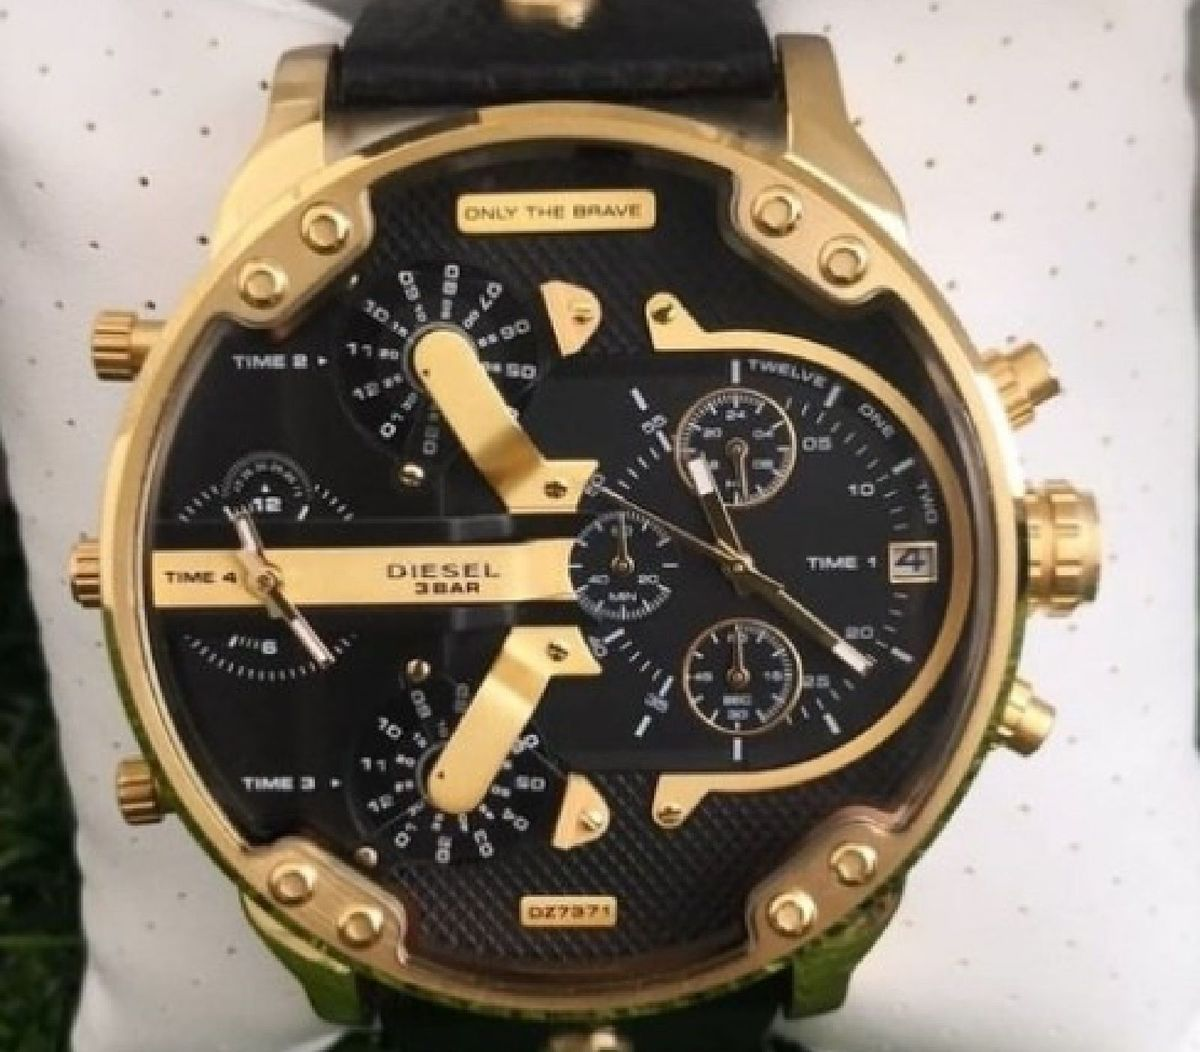 relógio diesel dz7371 pulseira couro lindo leia todo anúncio - relógios diesel